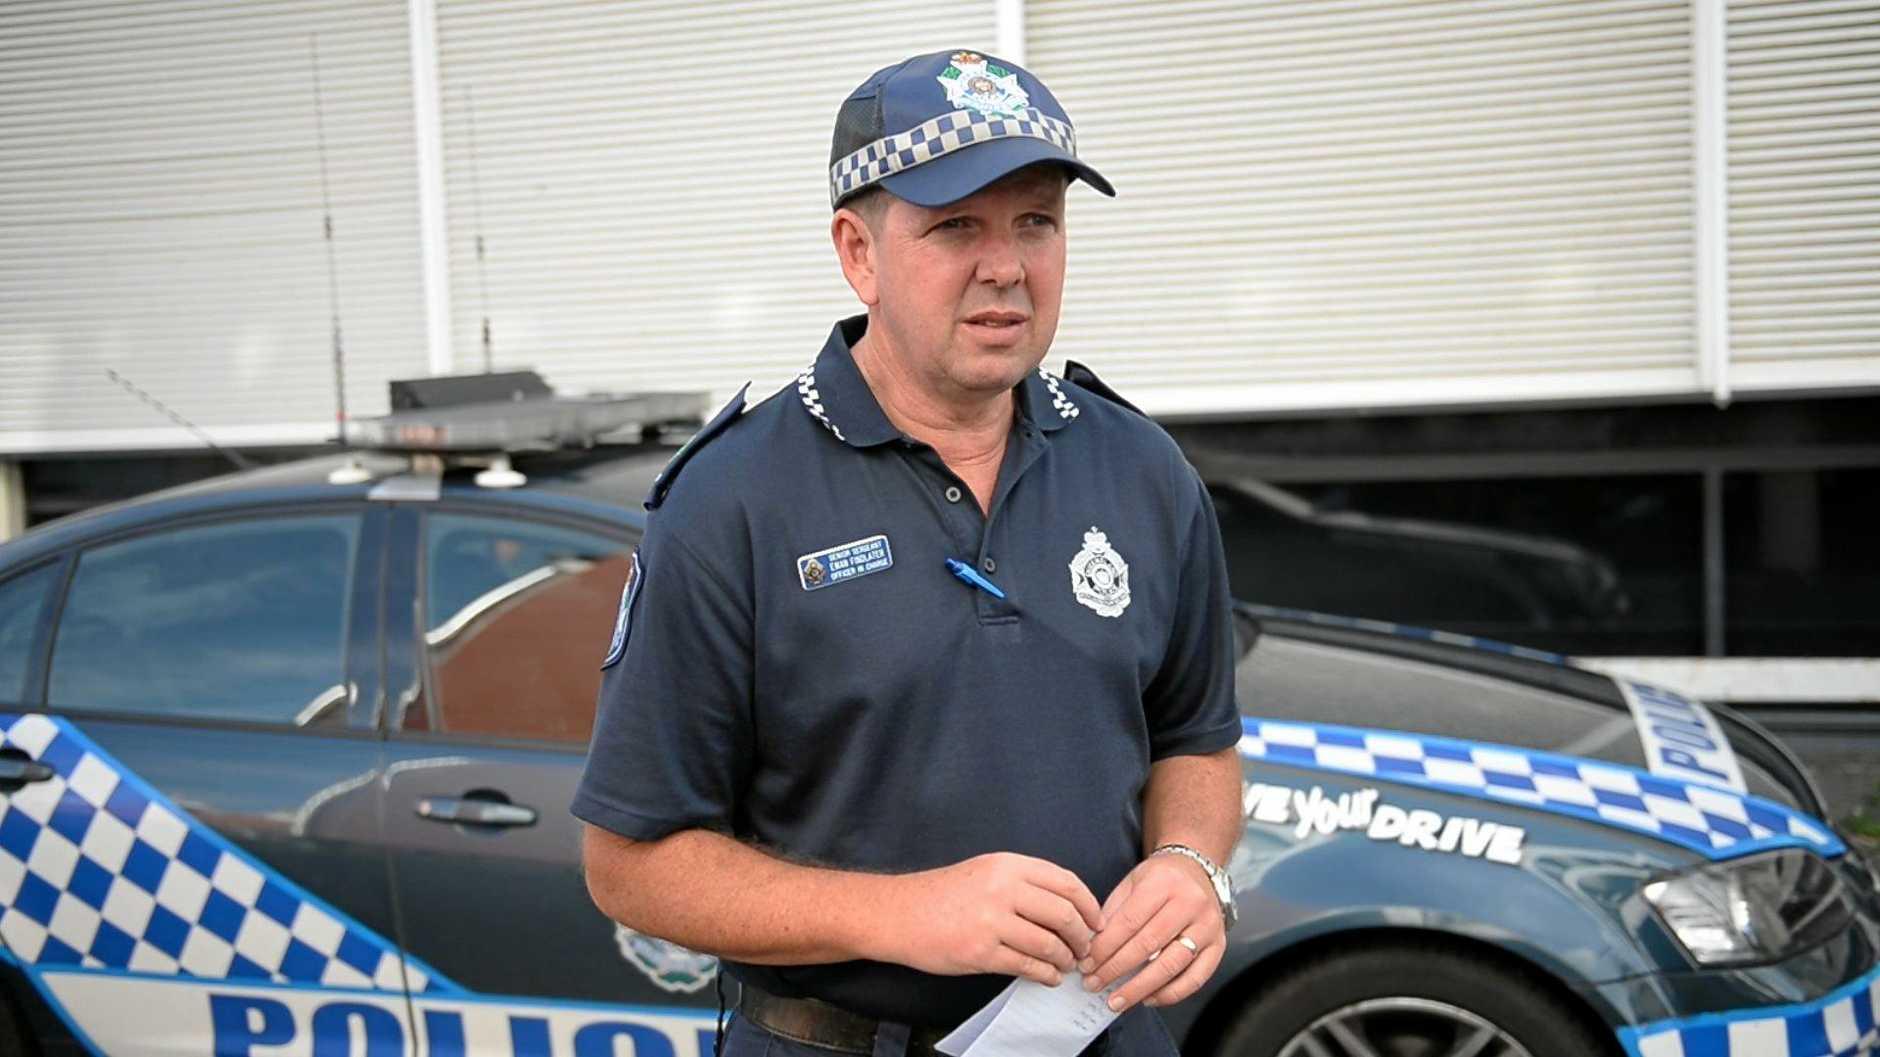 Senior Sergeant Ewan Findlater. Photo Allan Reinikka / The Morning Bulletin